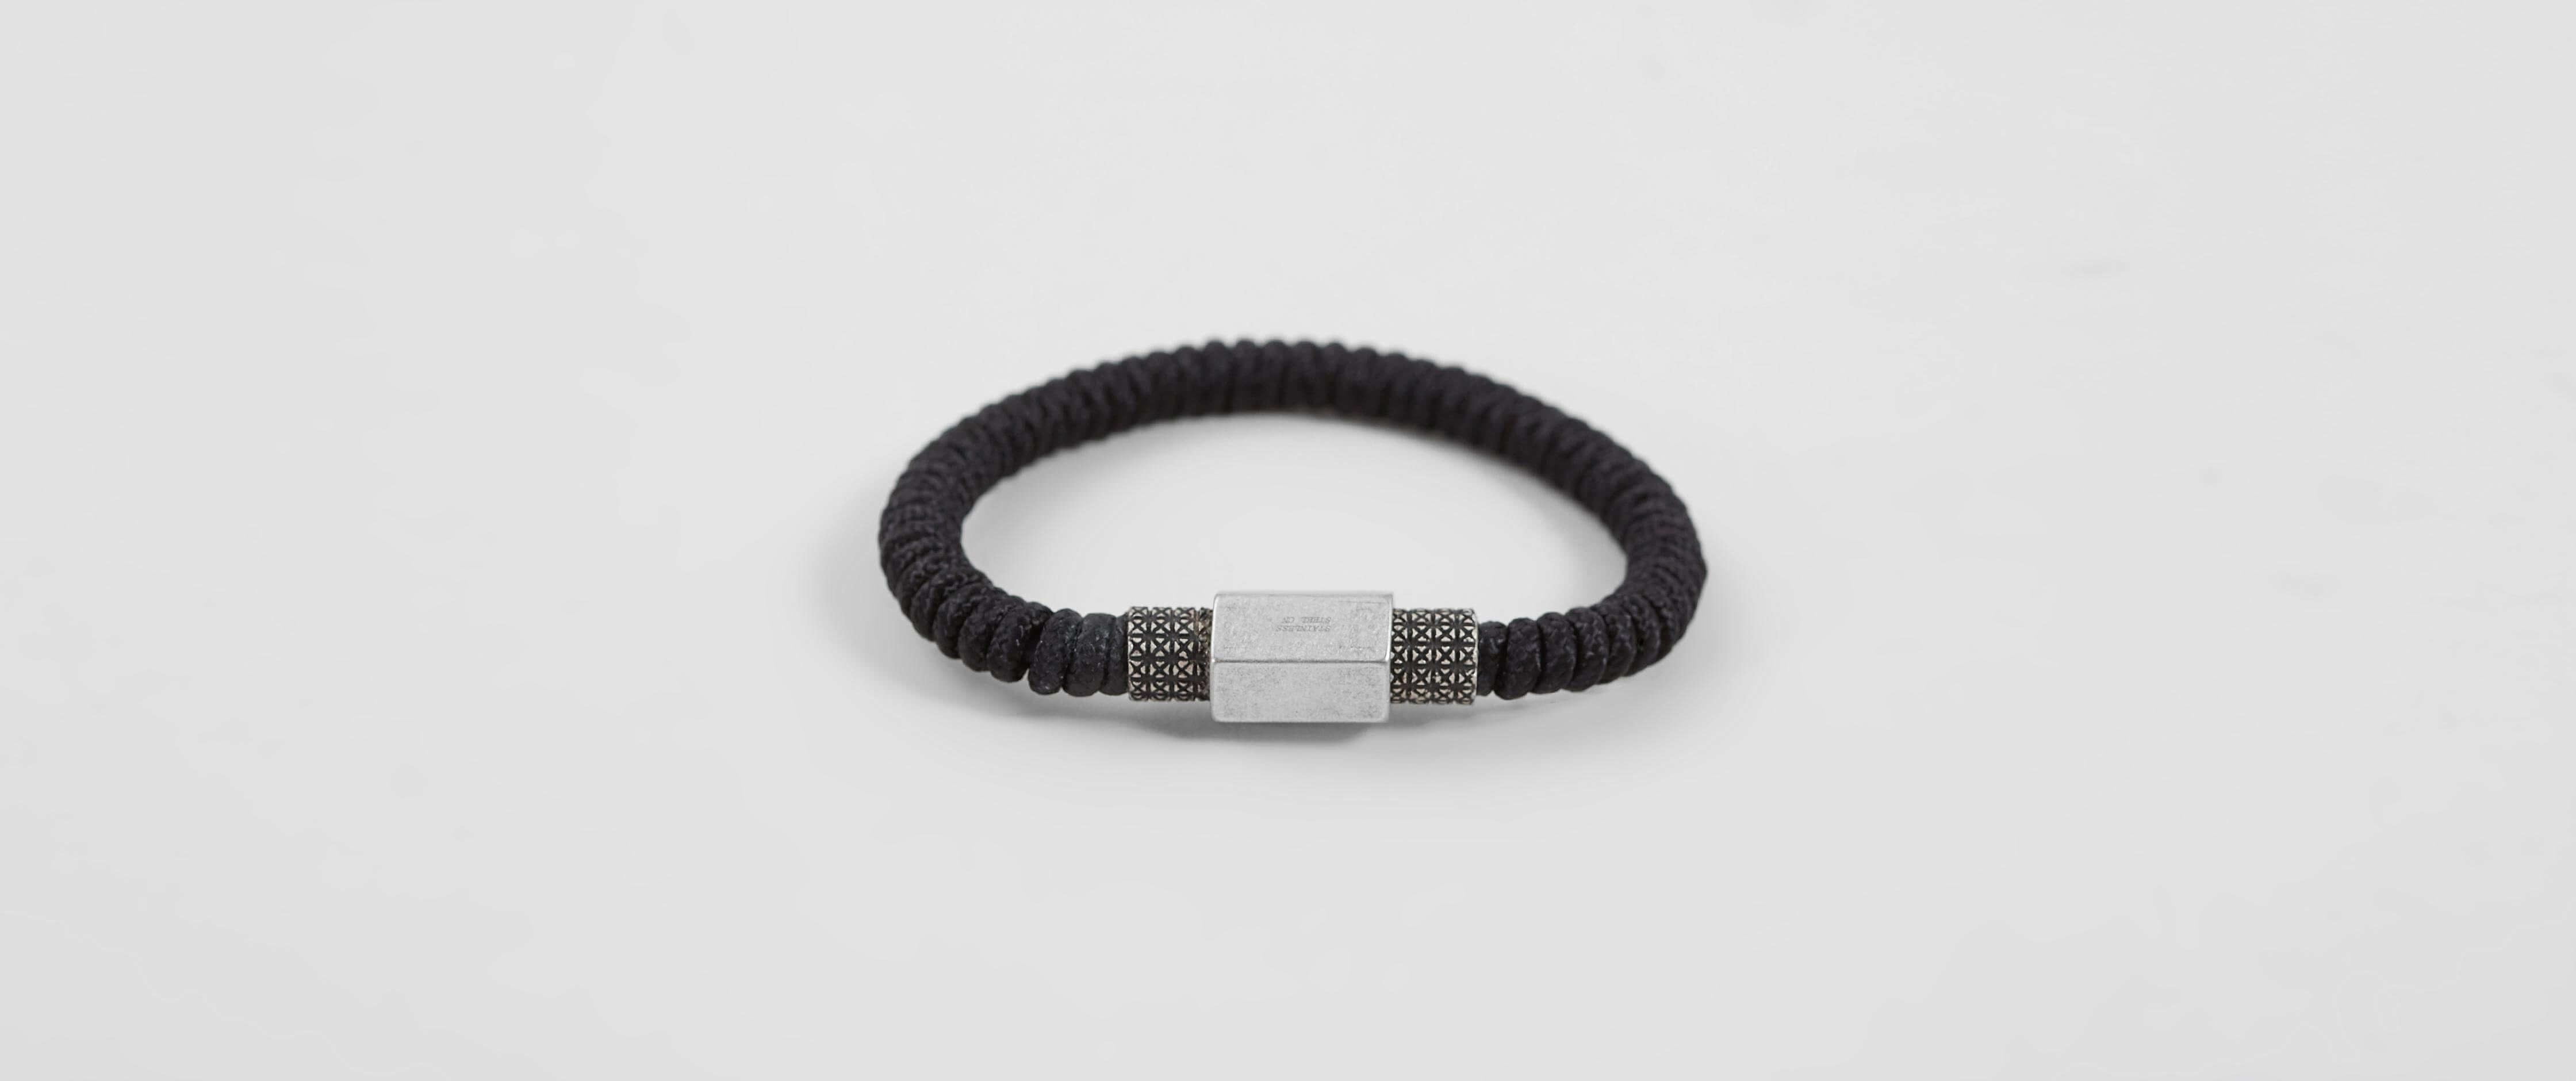 1913 Cord Bracelet